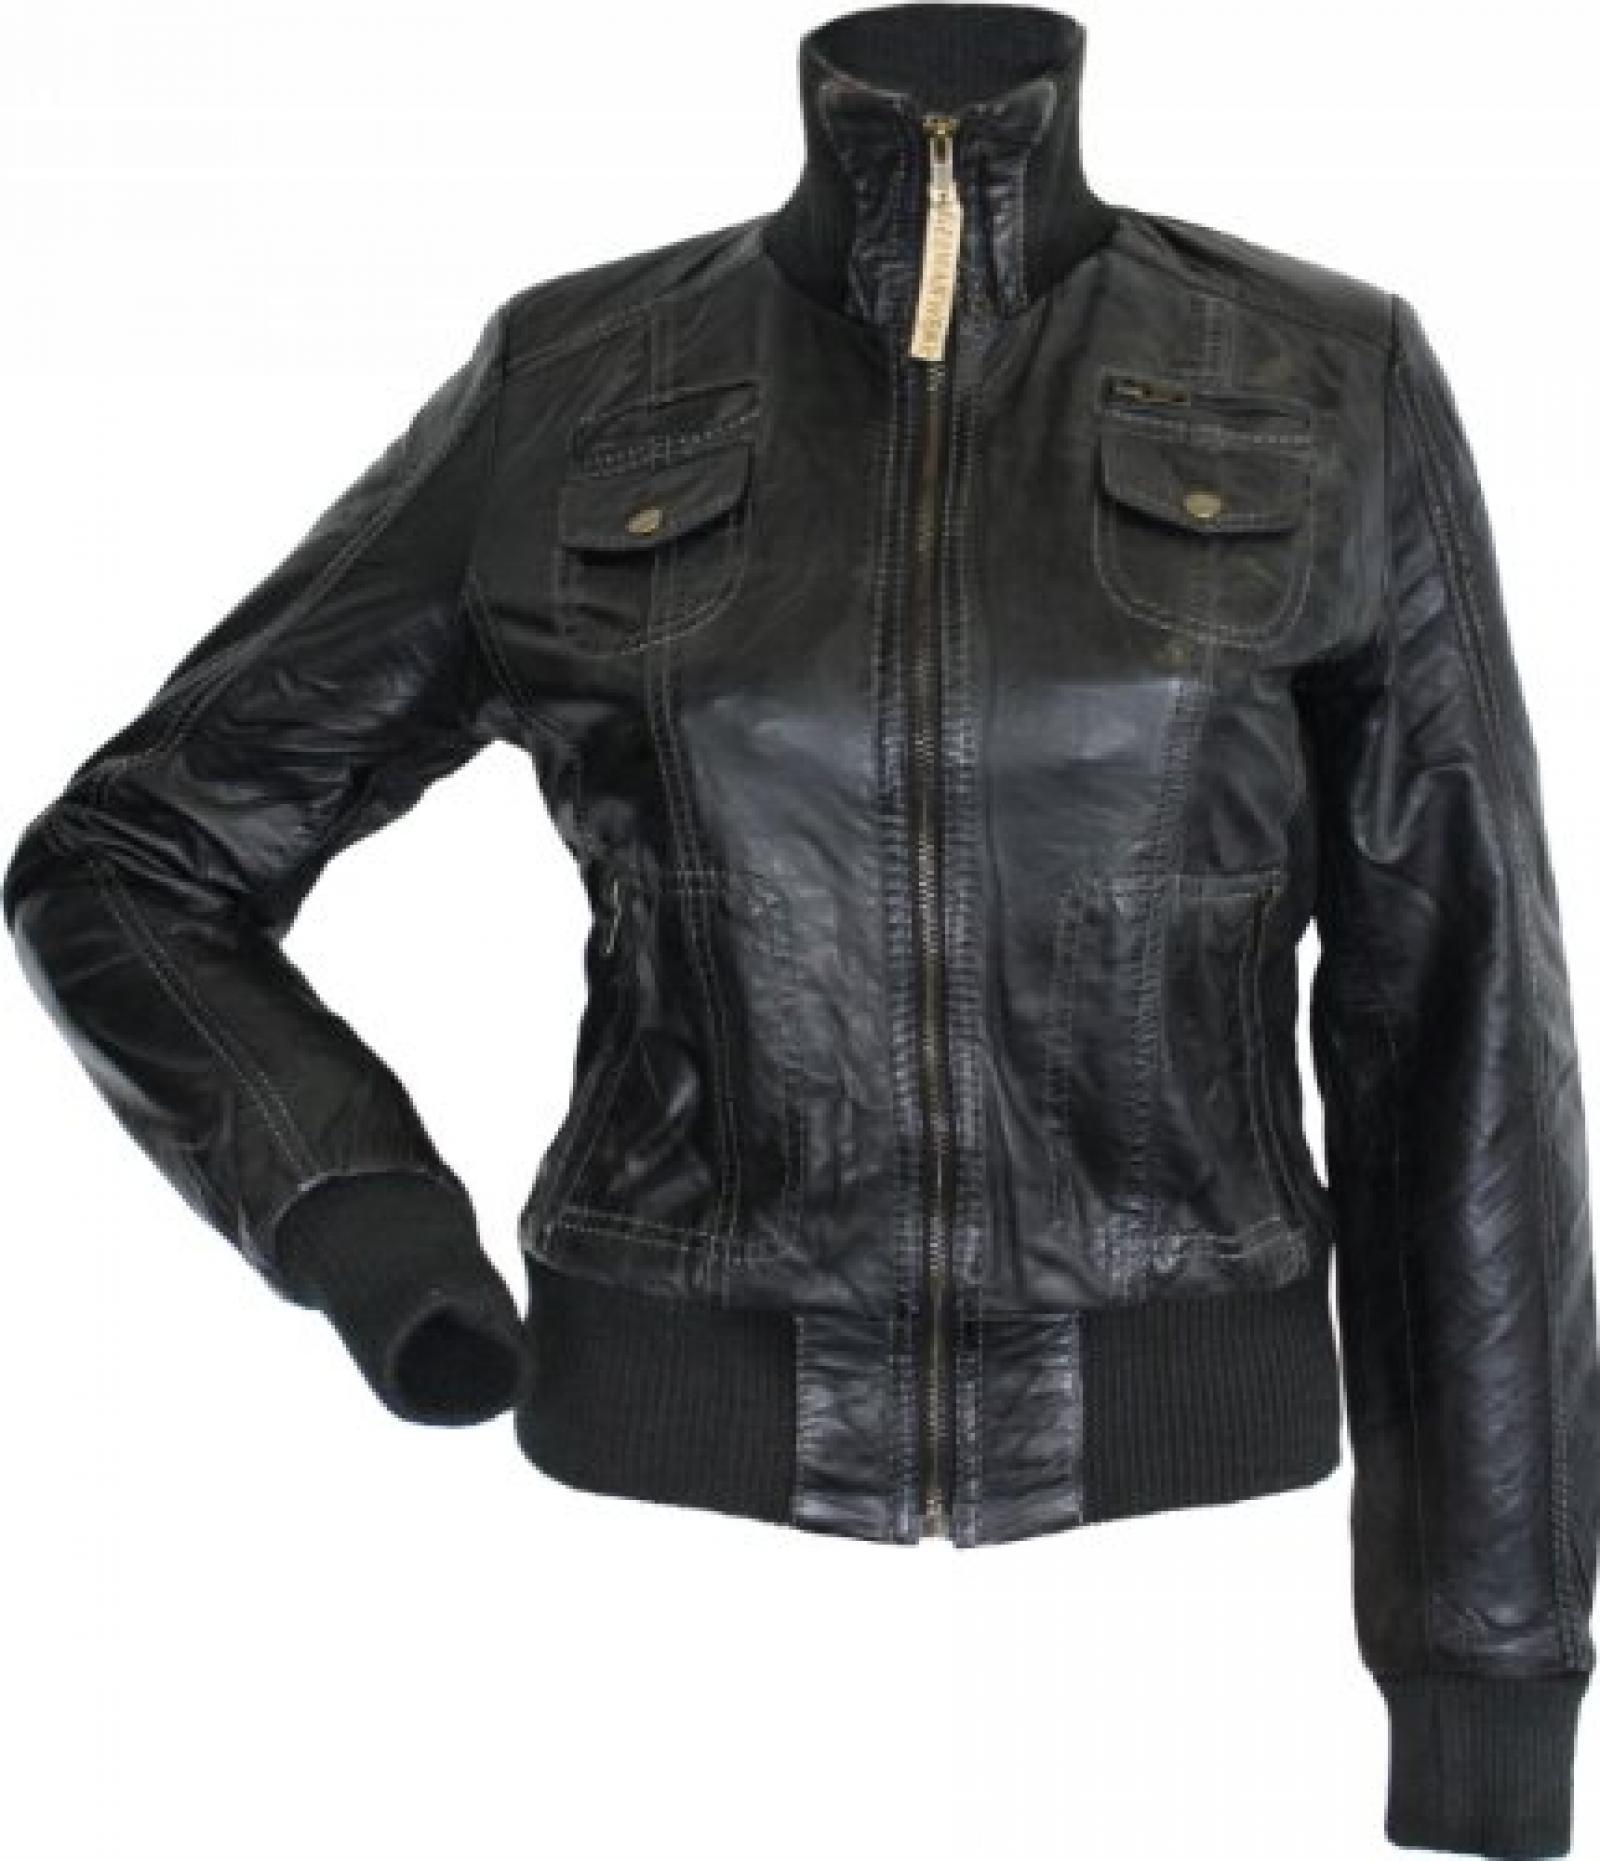 Damen Lederjacke Trend Fashion echtleder Jacke aus Lamm Nappa Leder schwarz